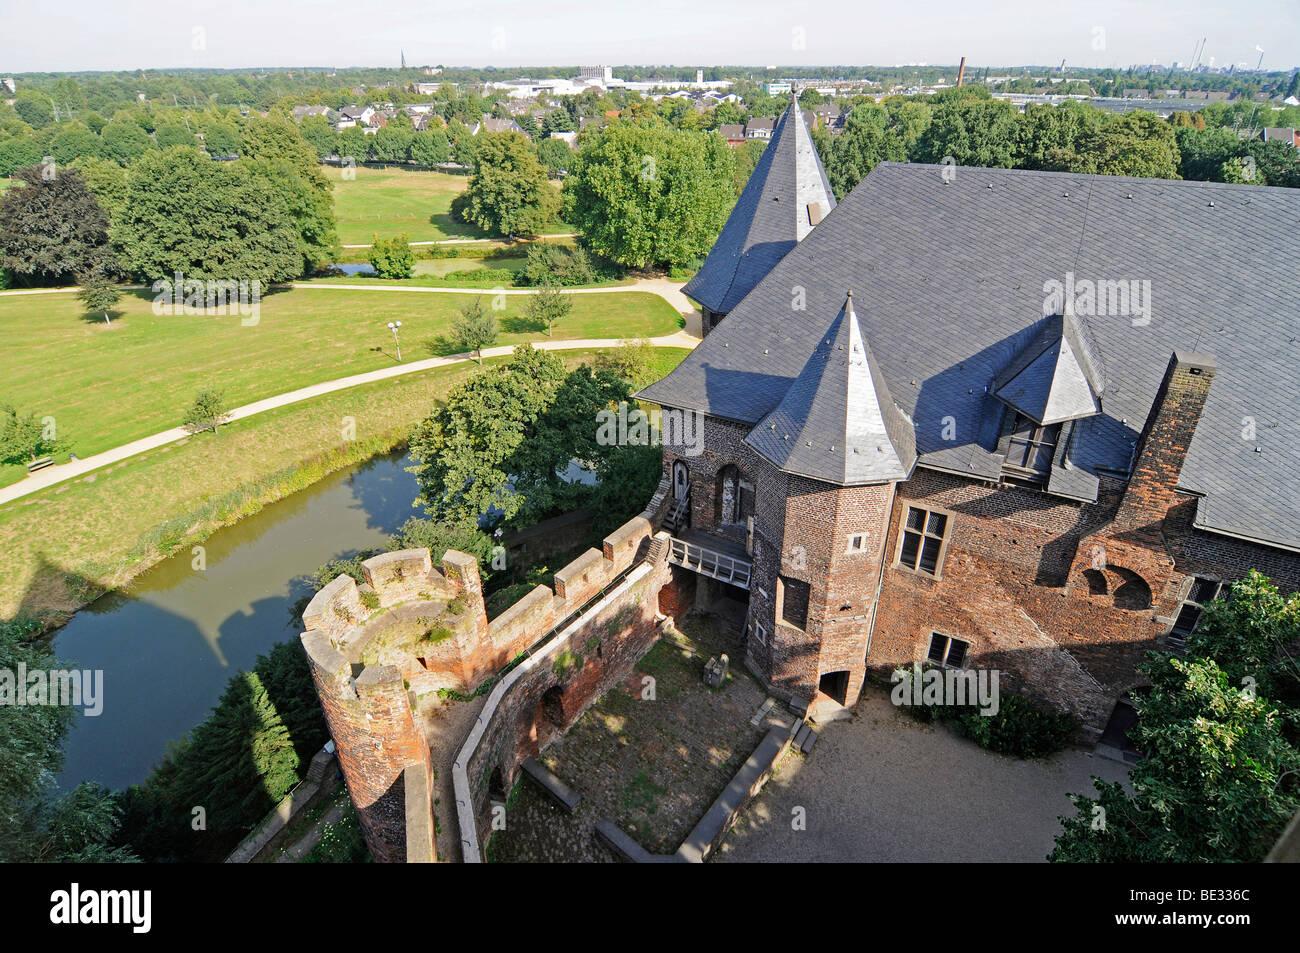 Overview, moat, courtyard, towers, Wasserburg Linn moated castle museum, Krefeld, North Rhine-Westphalia, Germany, - Stock Image